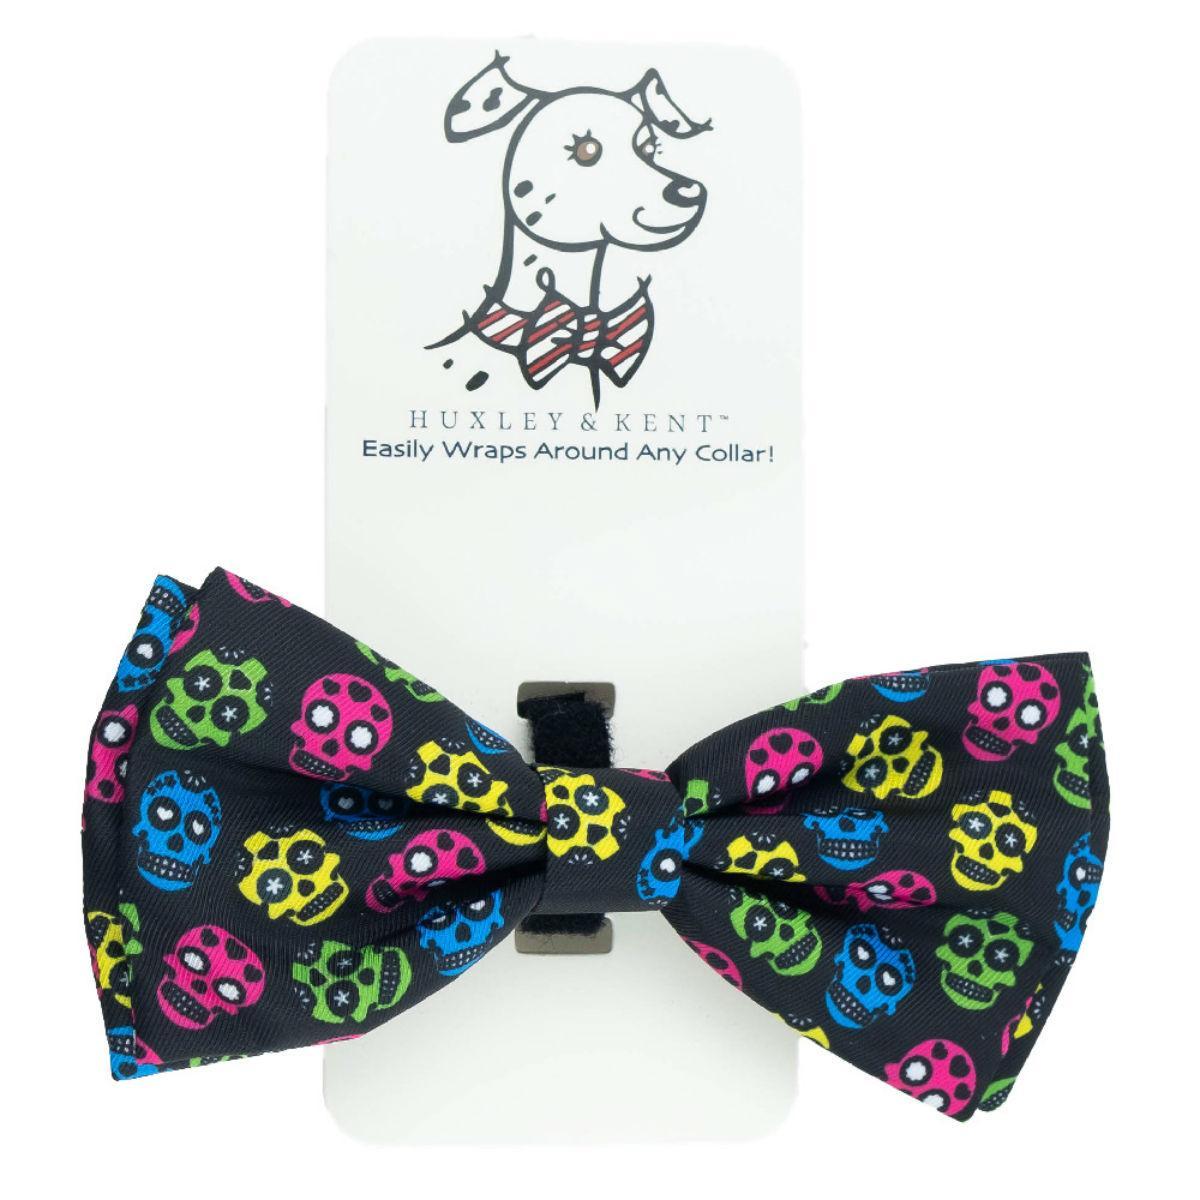 Huxley & Kent Dog Bow Tie Collar Attachment - Sugar Skulls